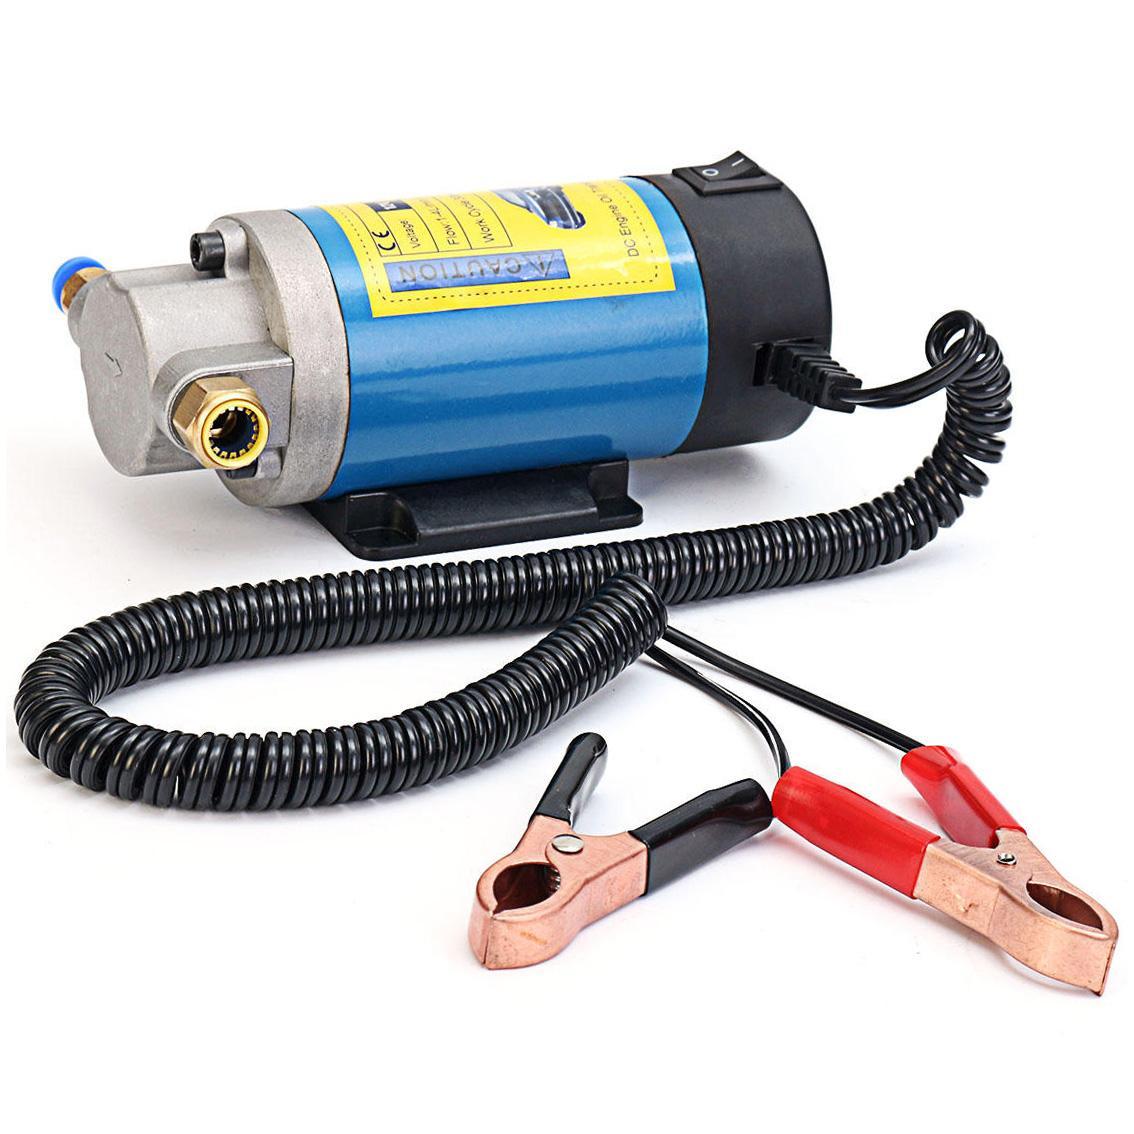 Miniature DC 12V 100W 4 Litre Petrol Oil Fluid Extractor Car Engine Oil Transfer Pump Fluid Diesel Electric Siphon Vacuum